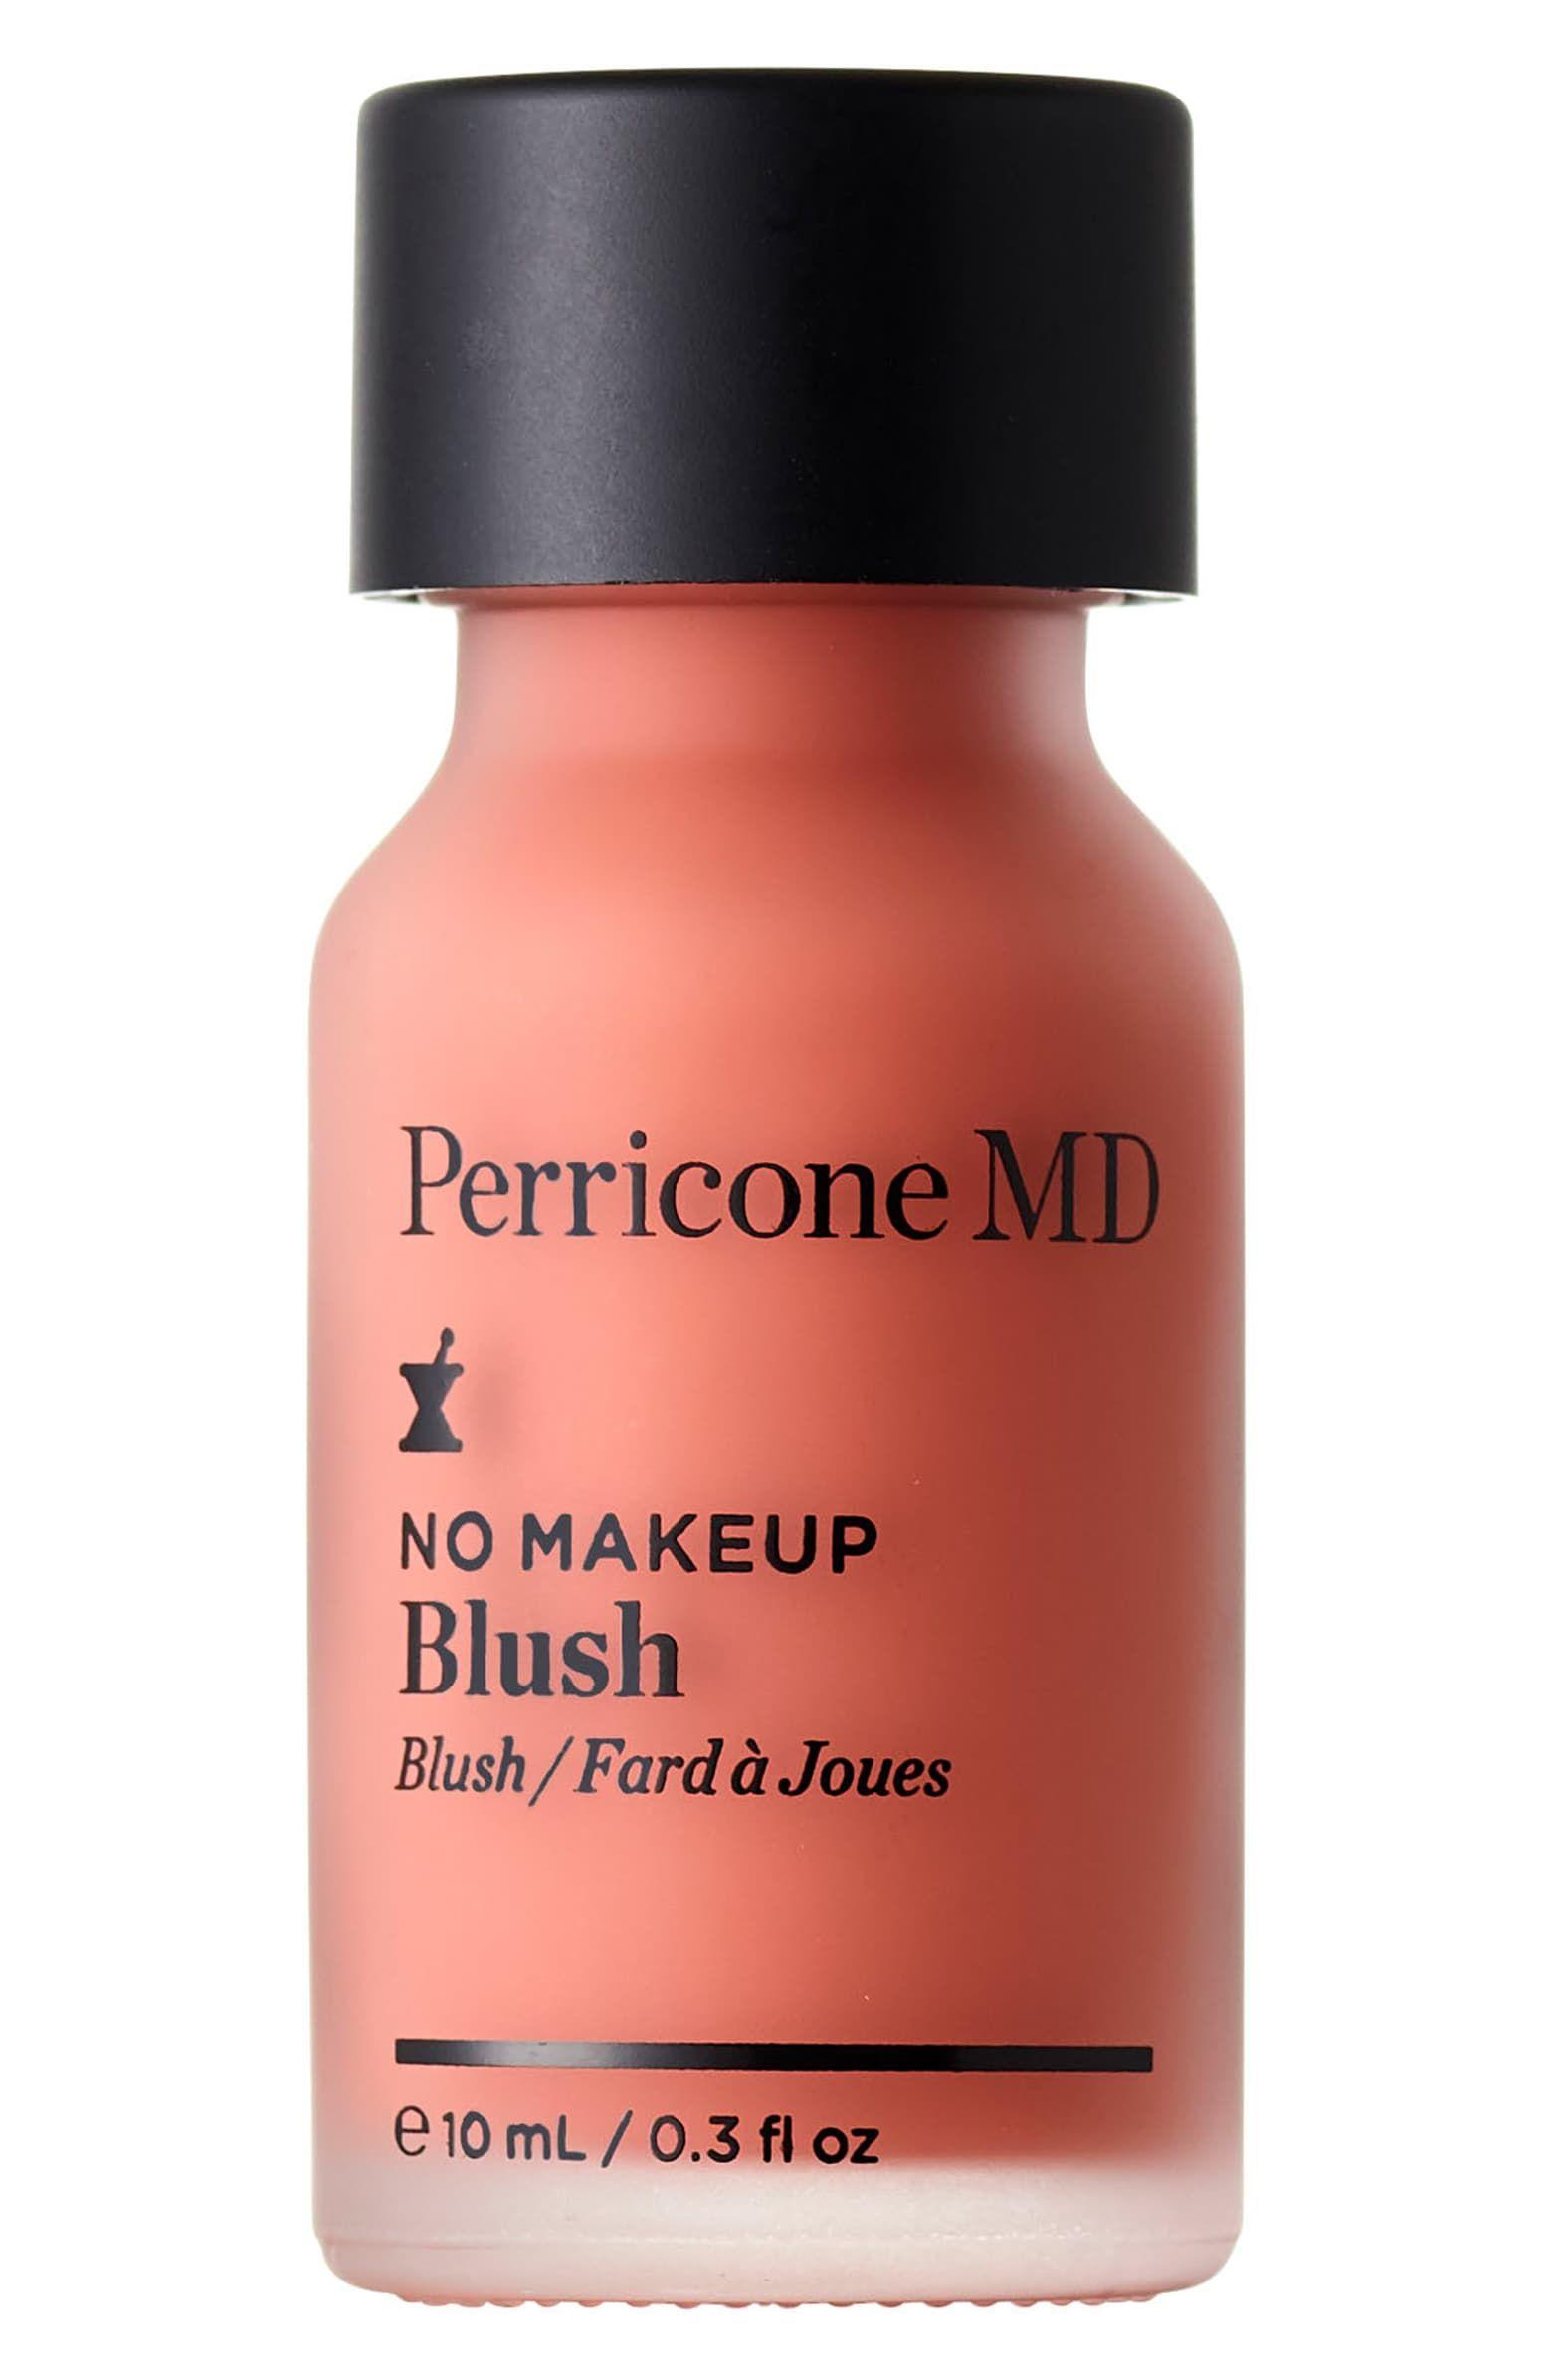 Perricone MD No Makeup Blush Blush makeup, Perricone md